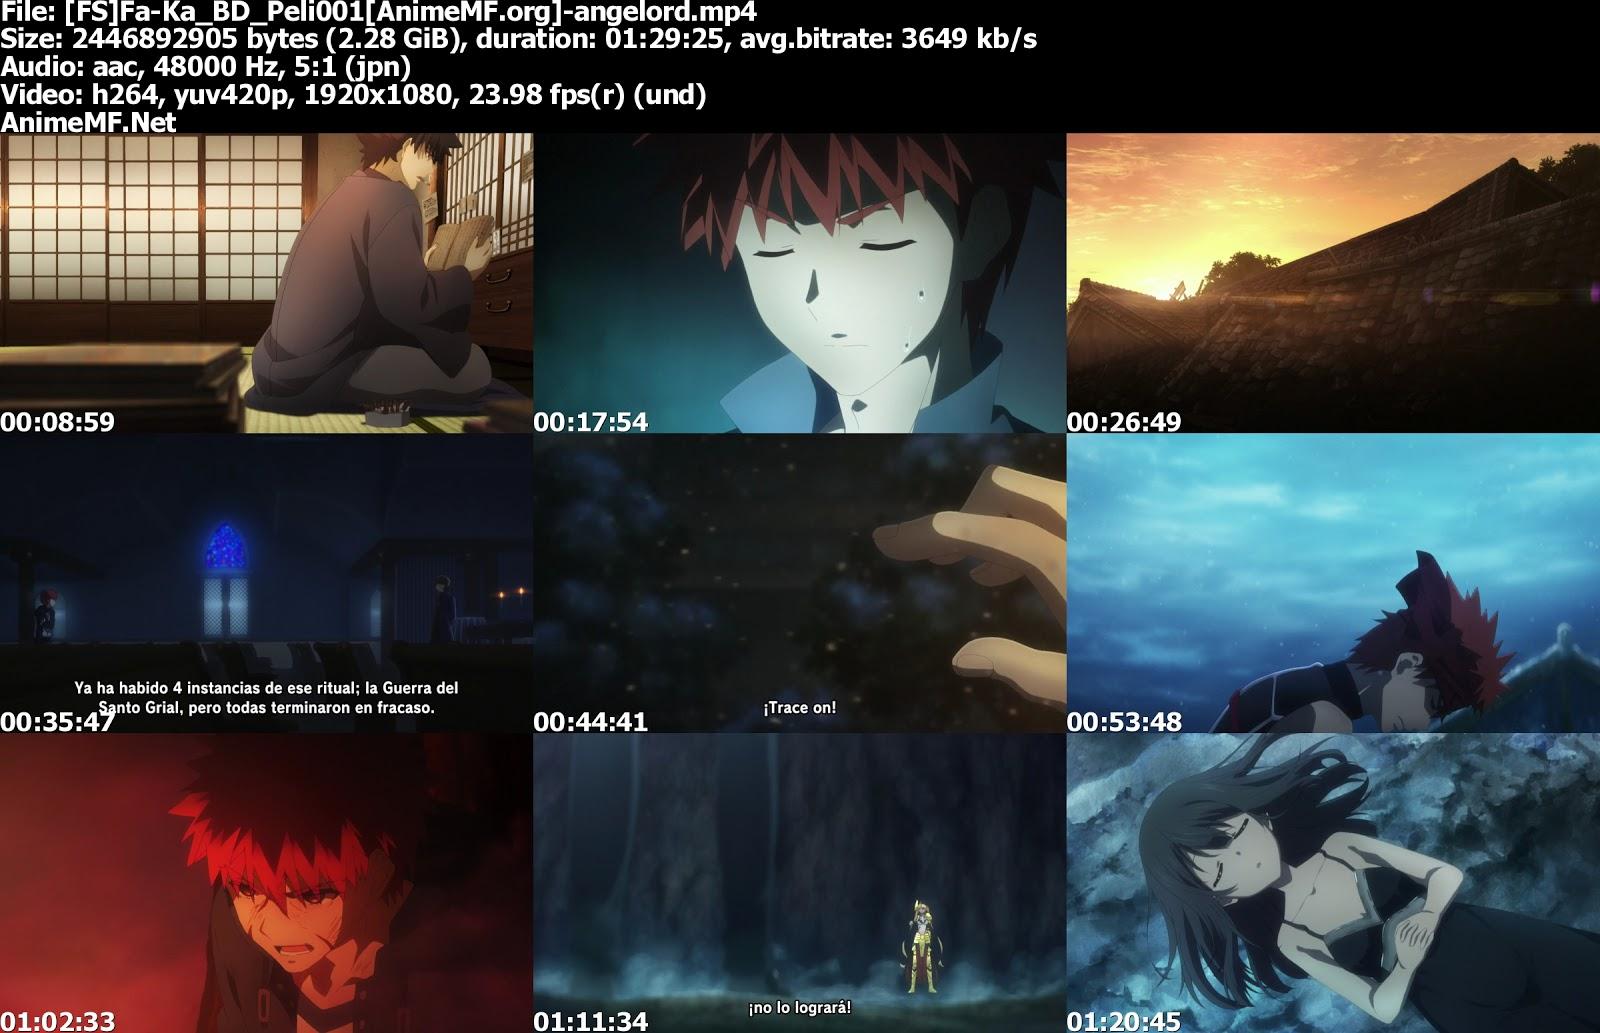 Fate/kaleid liner Prisma☆Illya: Sekka no Chikai